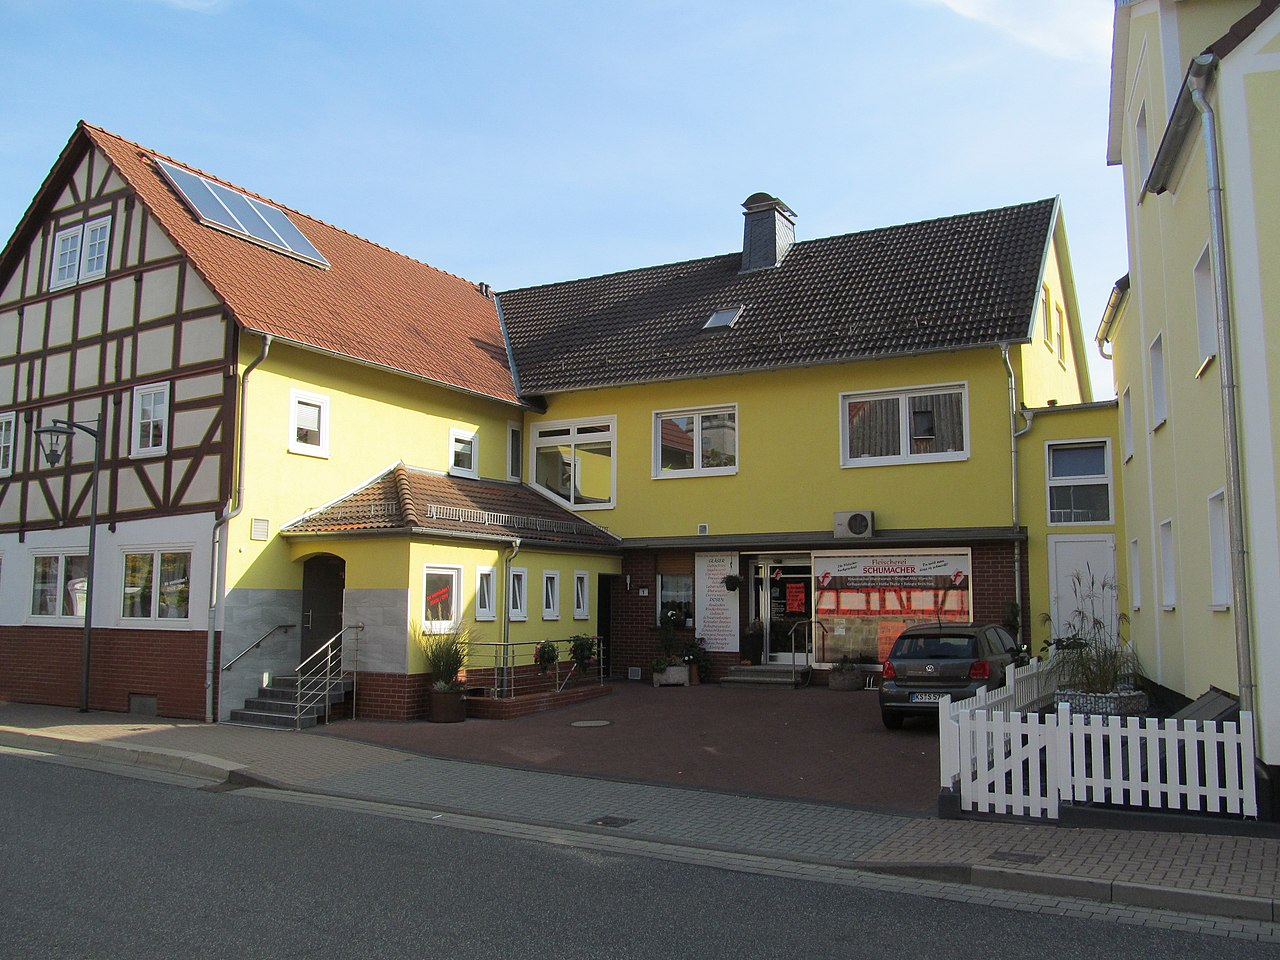 Vollmarshausen